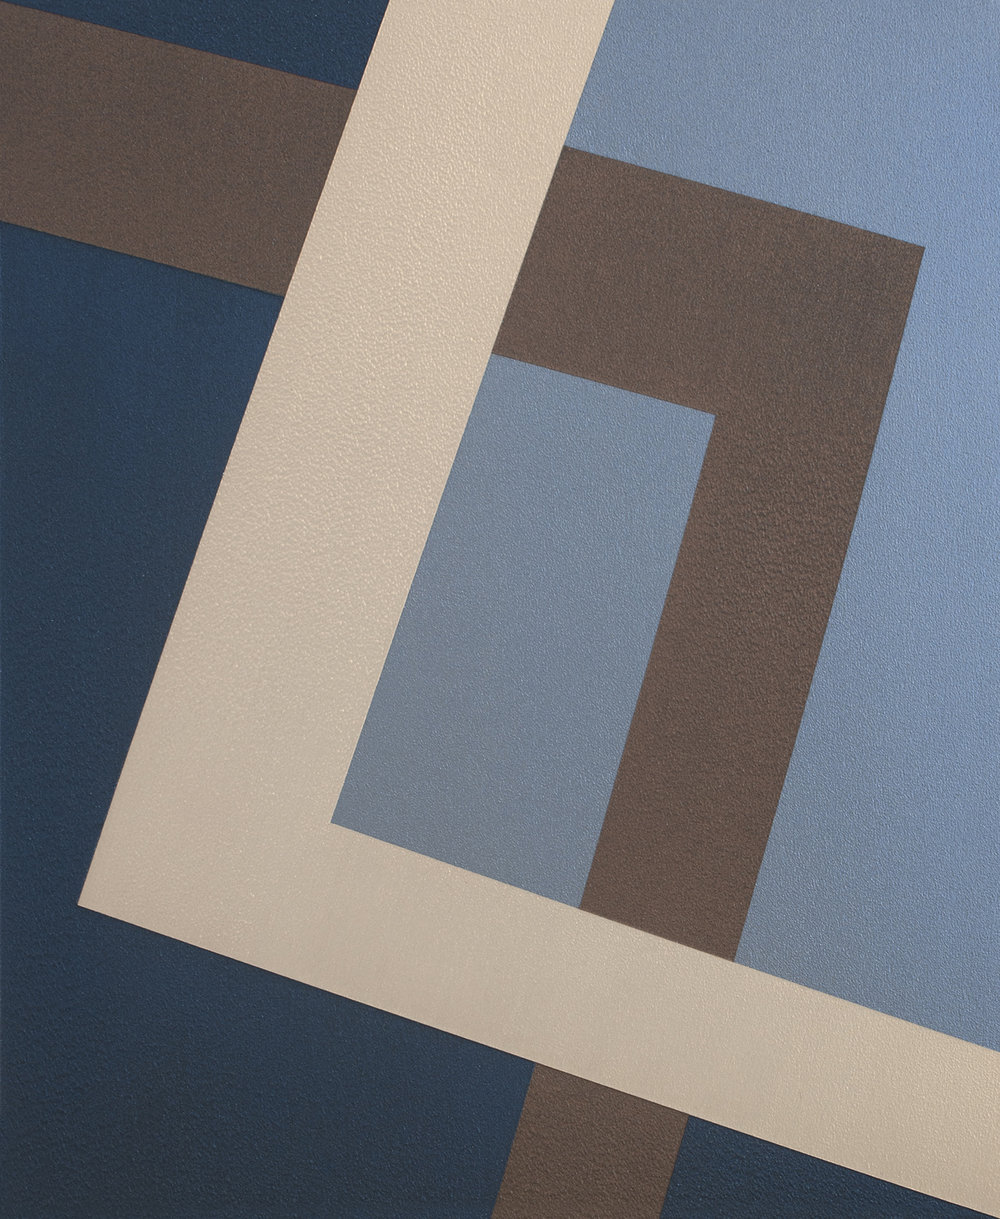 SAMARA ADAMSON-PINCZEWSKI  Copper Corner 2  2014 acrylic on wood panel 30 ×25 cm